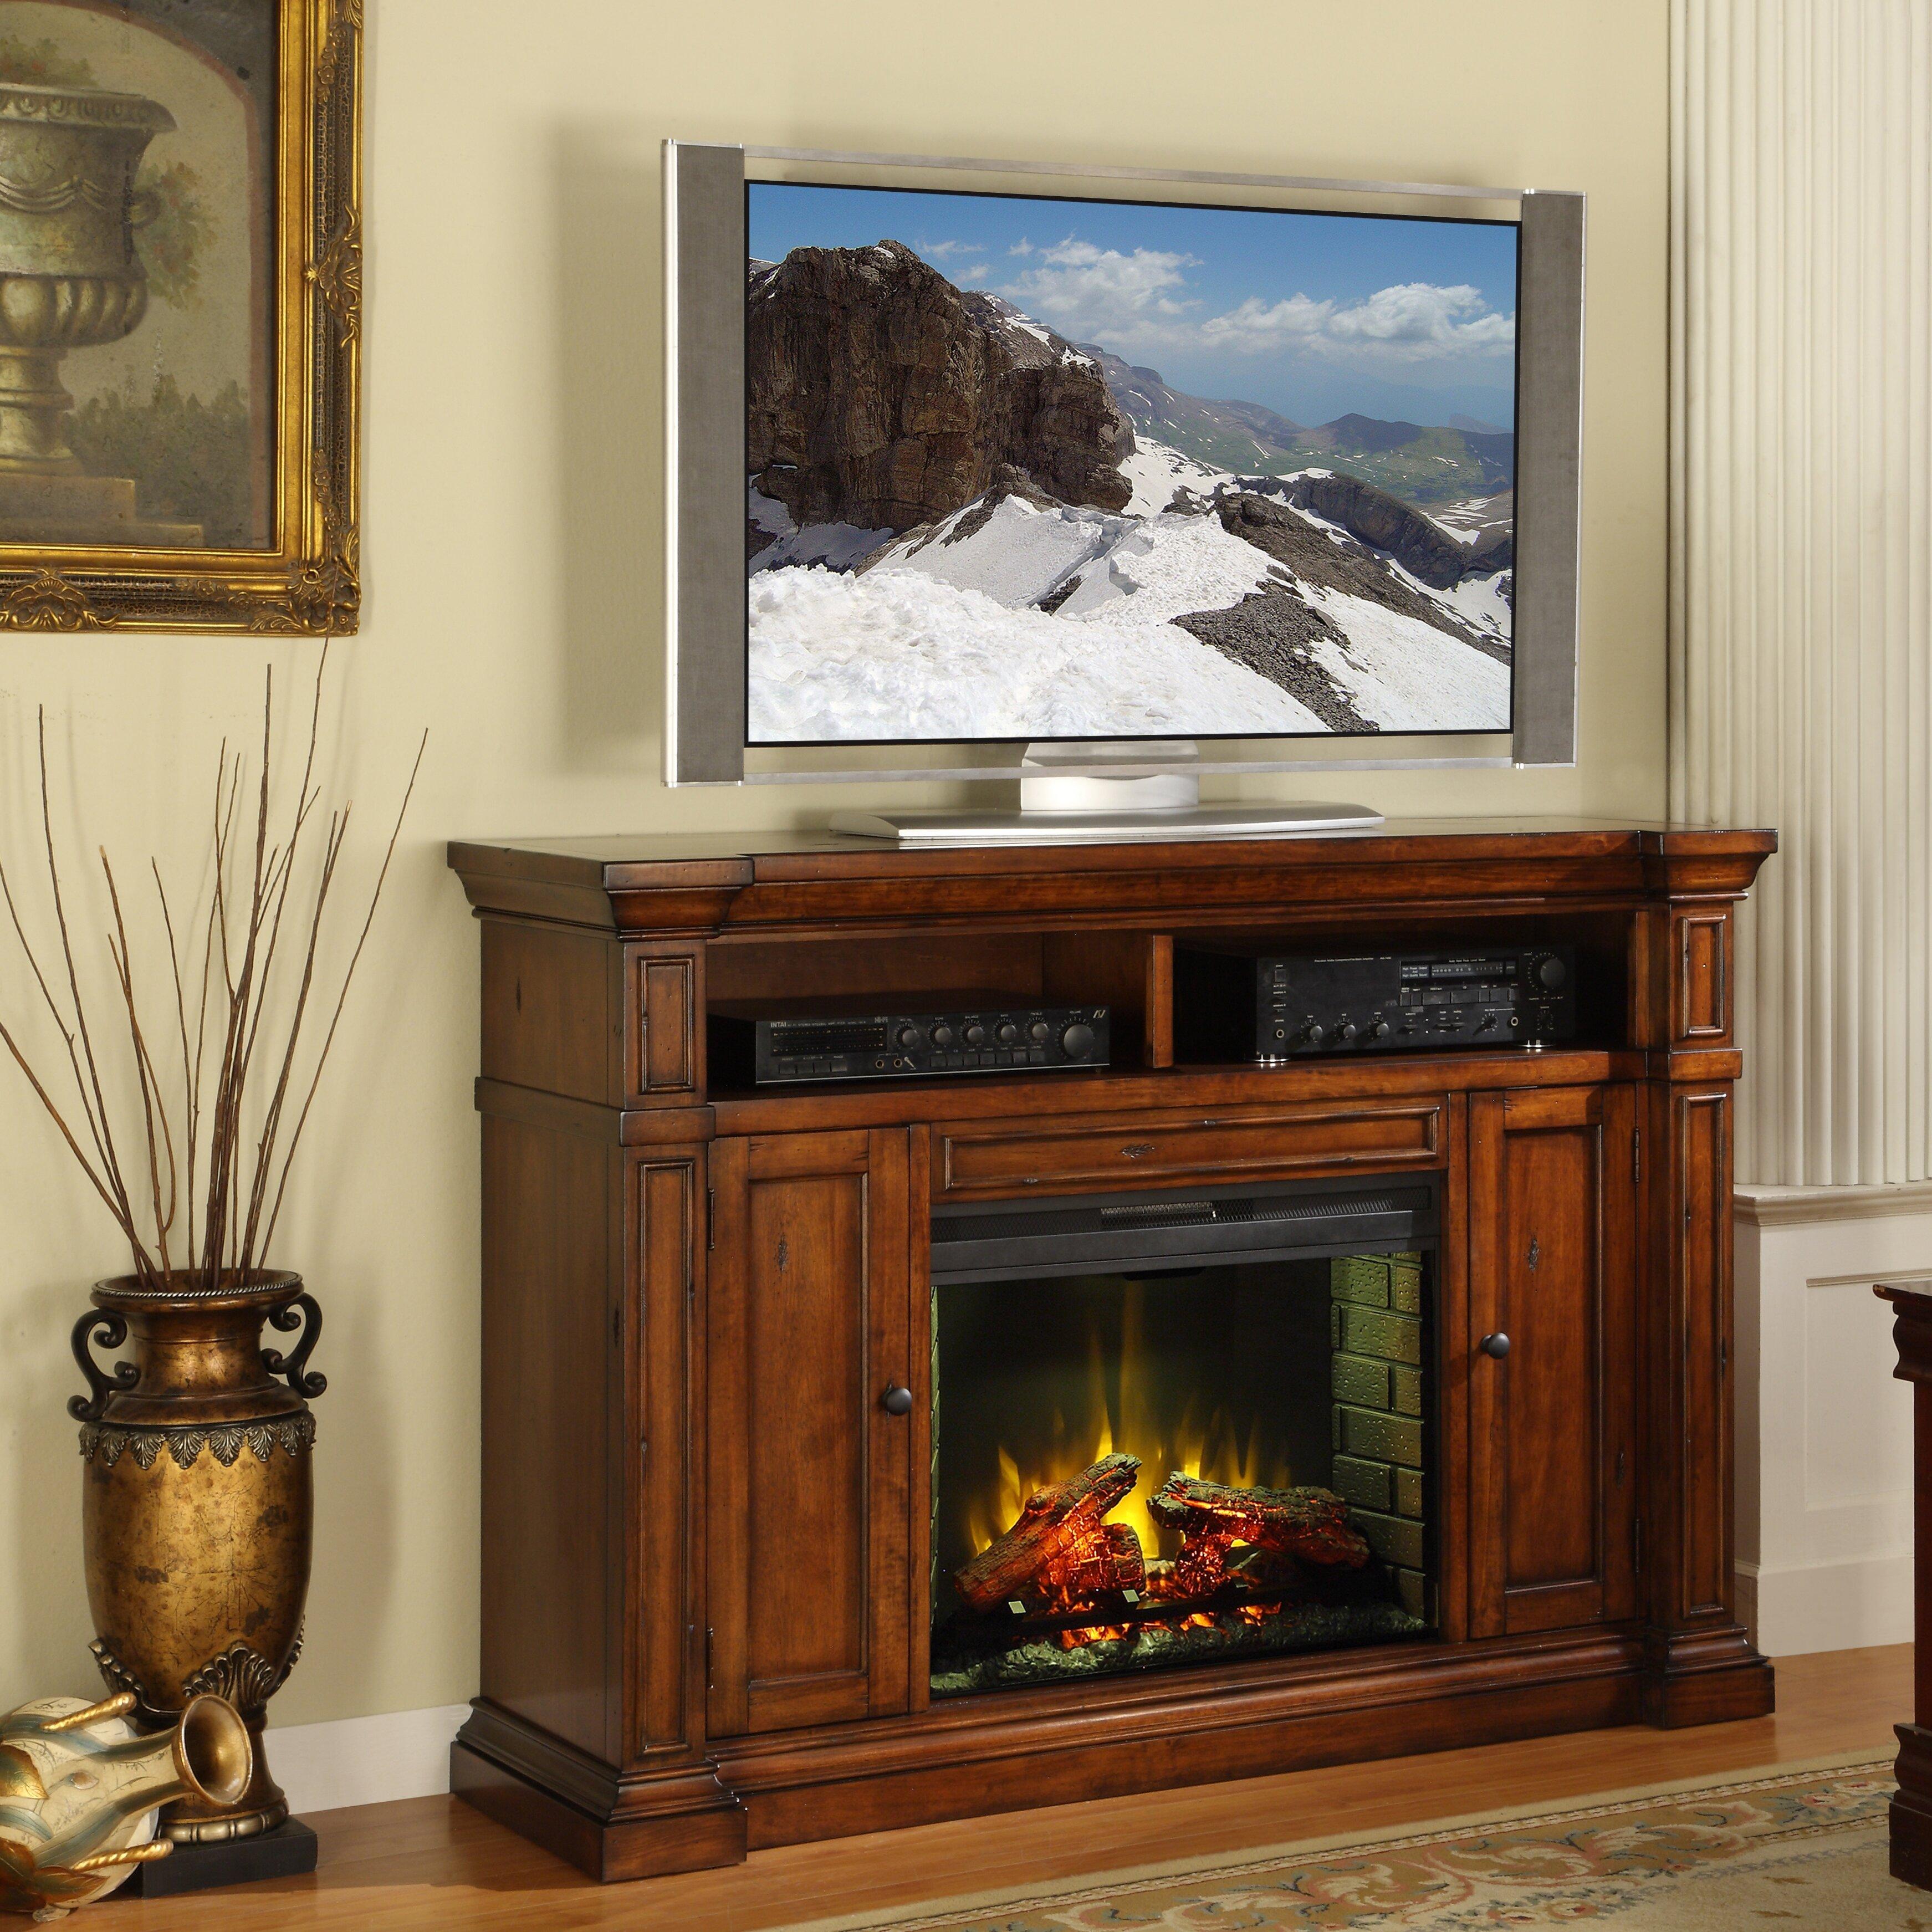 legends furniture berkshire tv stand with electric fireplace reviews wayfair. Black Bedroom Furniture Sets. Home Design Ideas